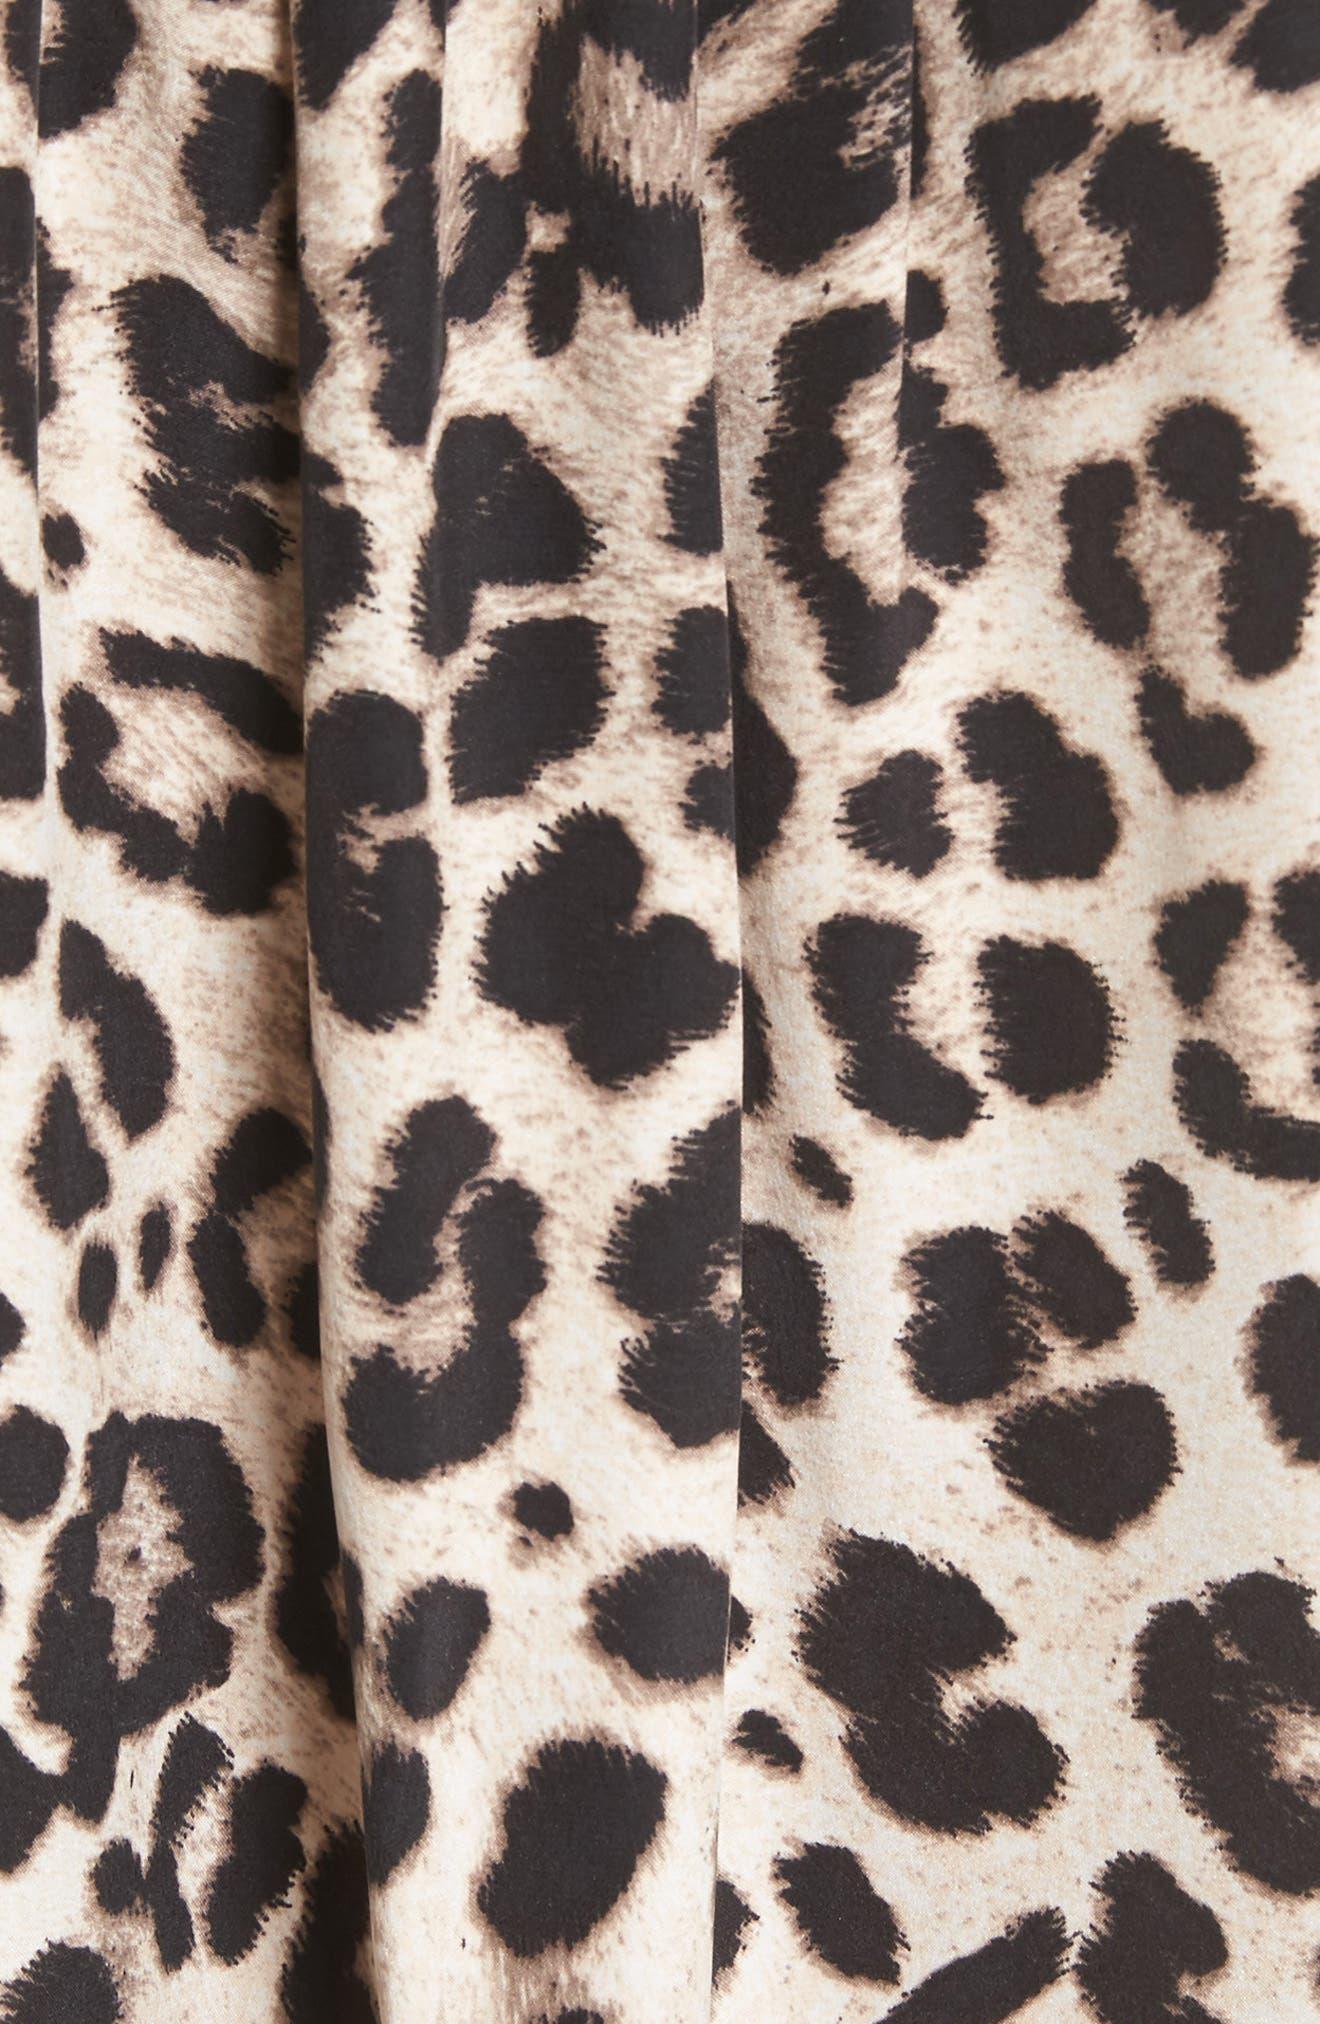 Amone Leopard Print Silk Top,                             Alternate thumbnail 5, color,